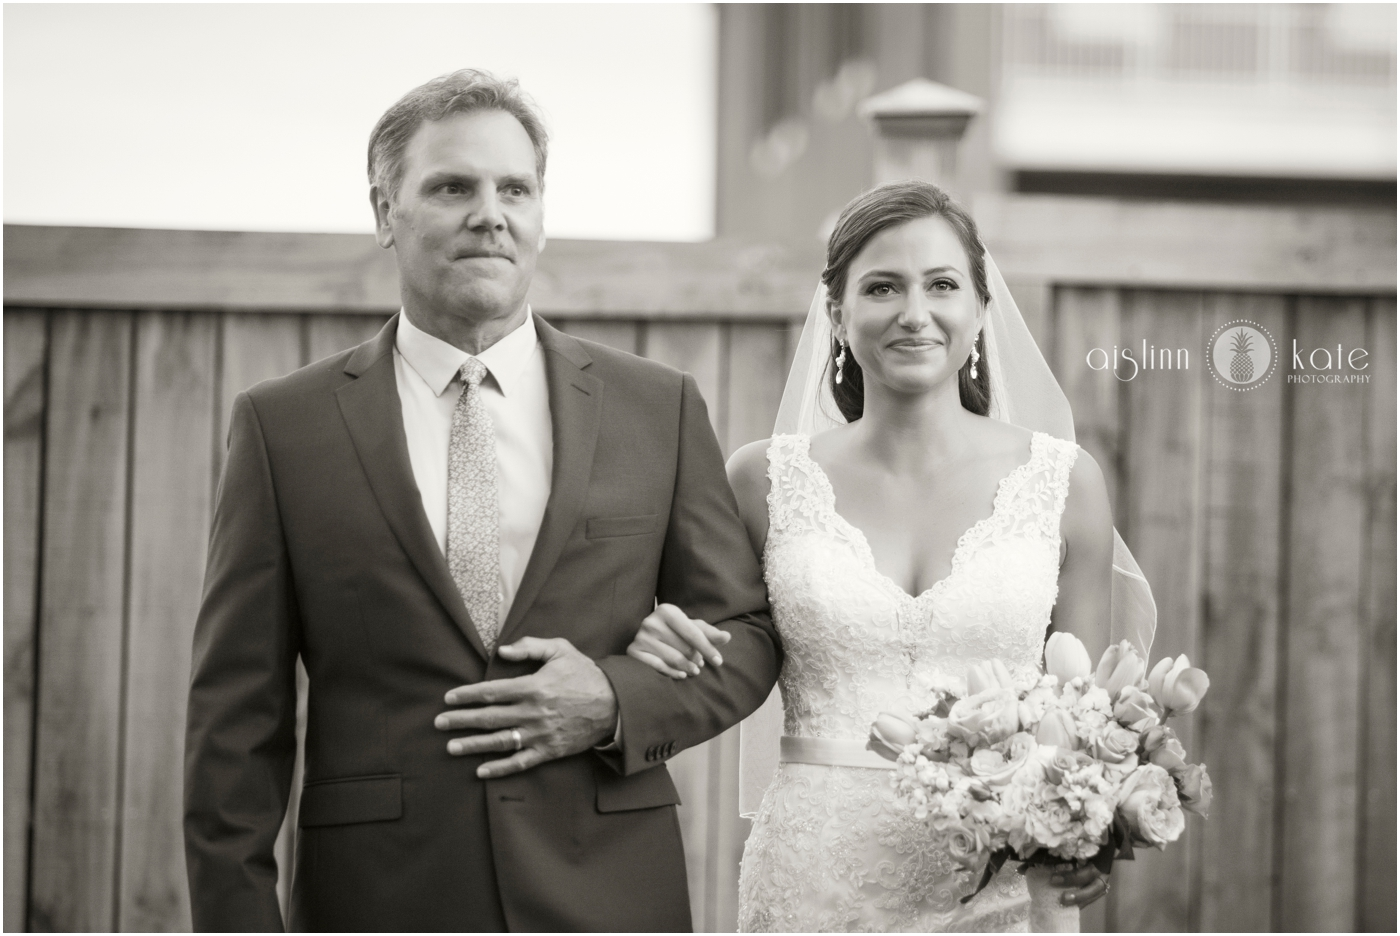 Pensacola-Destin-Wedding-Photographer-7602.jpg